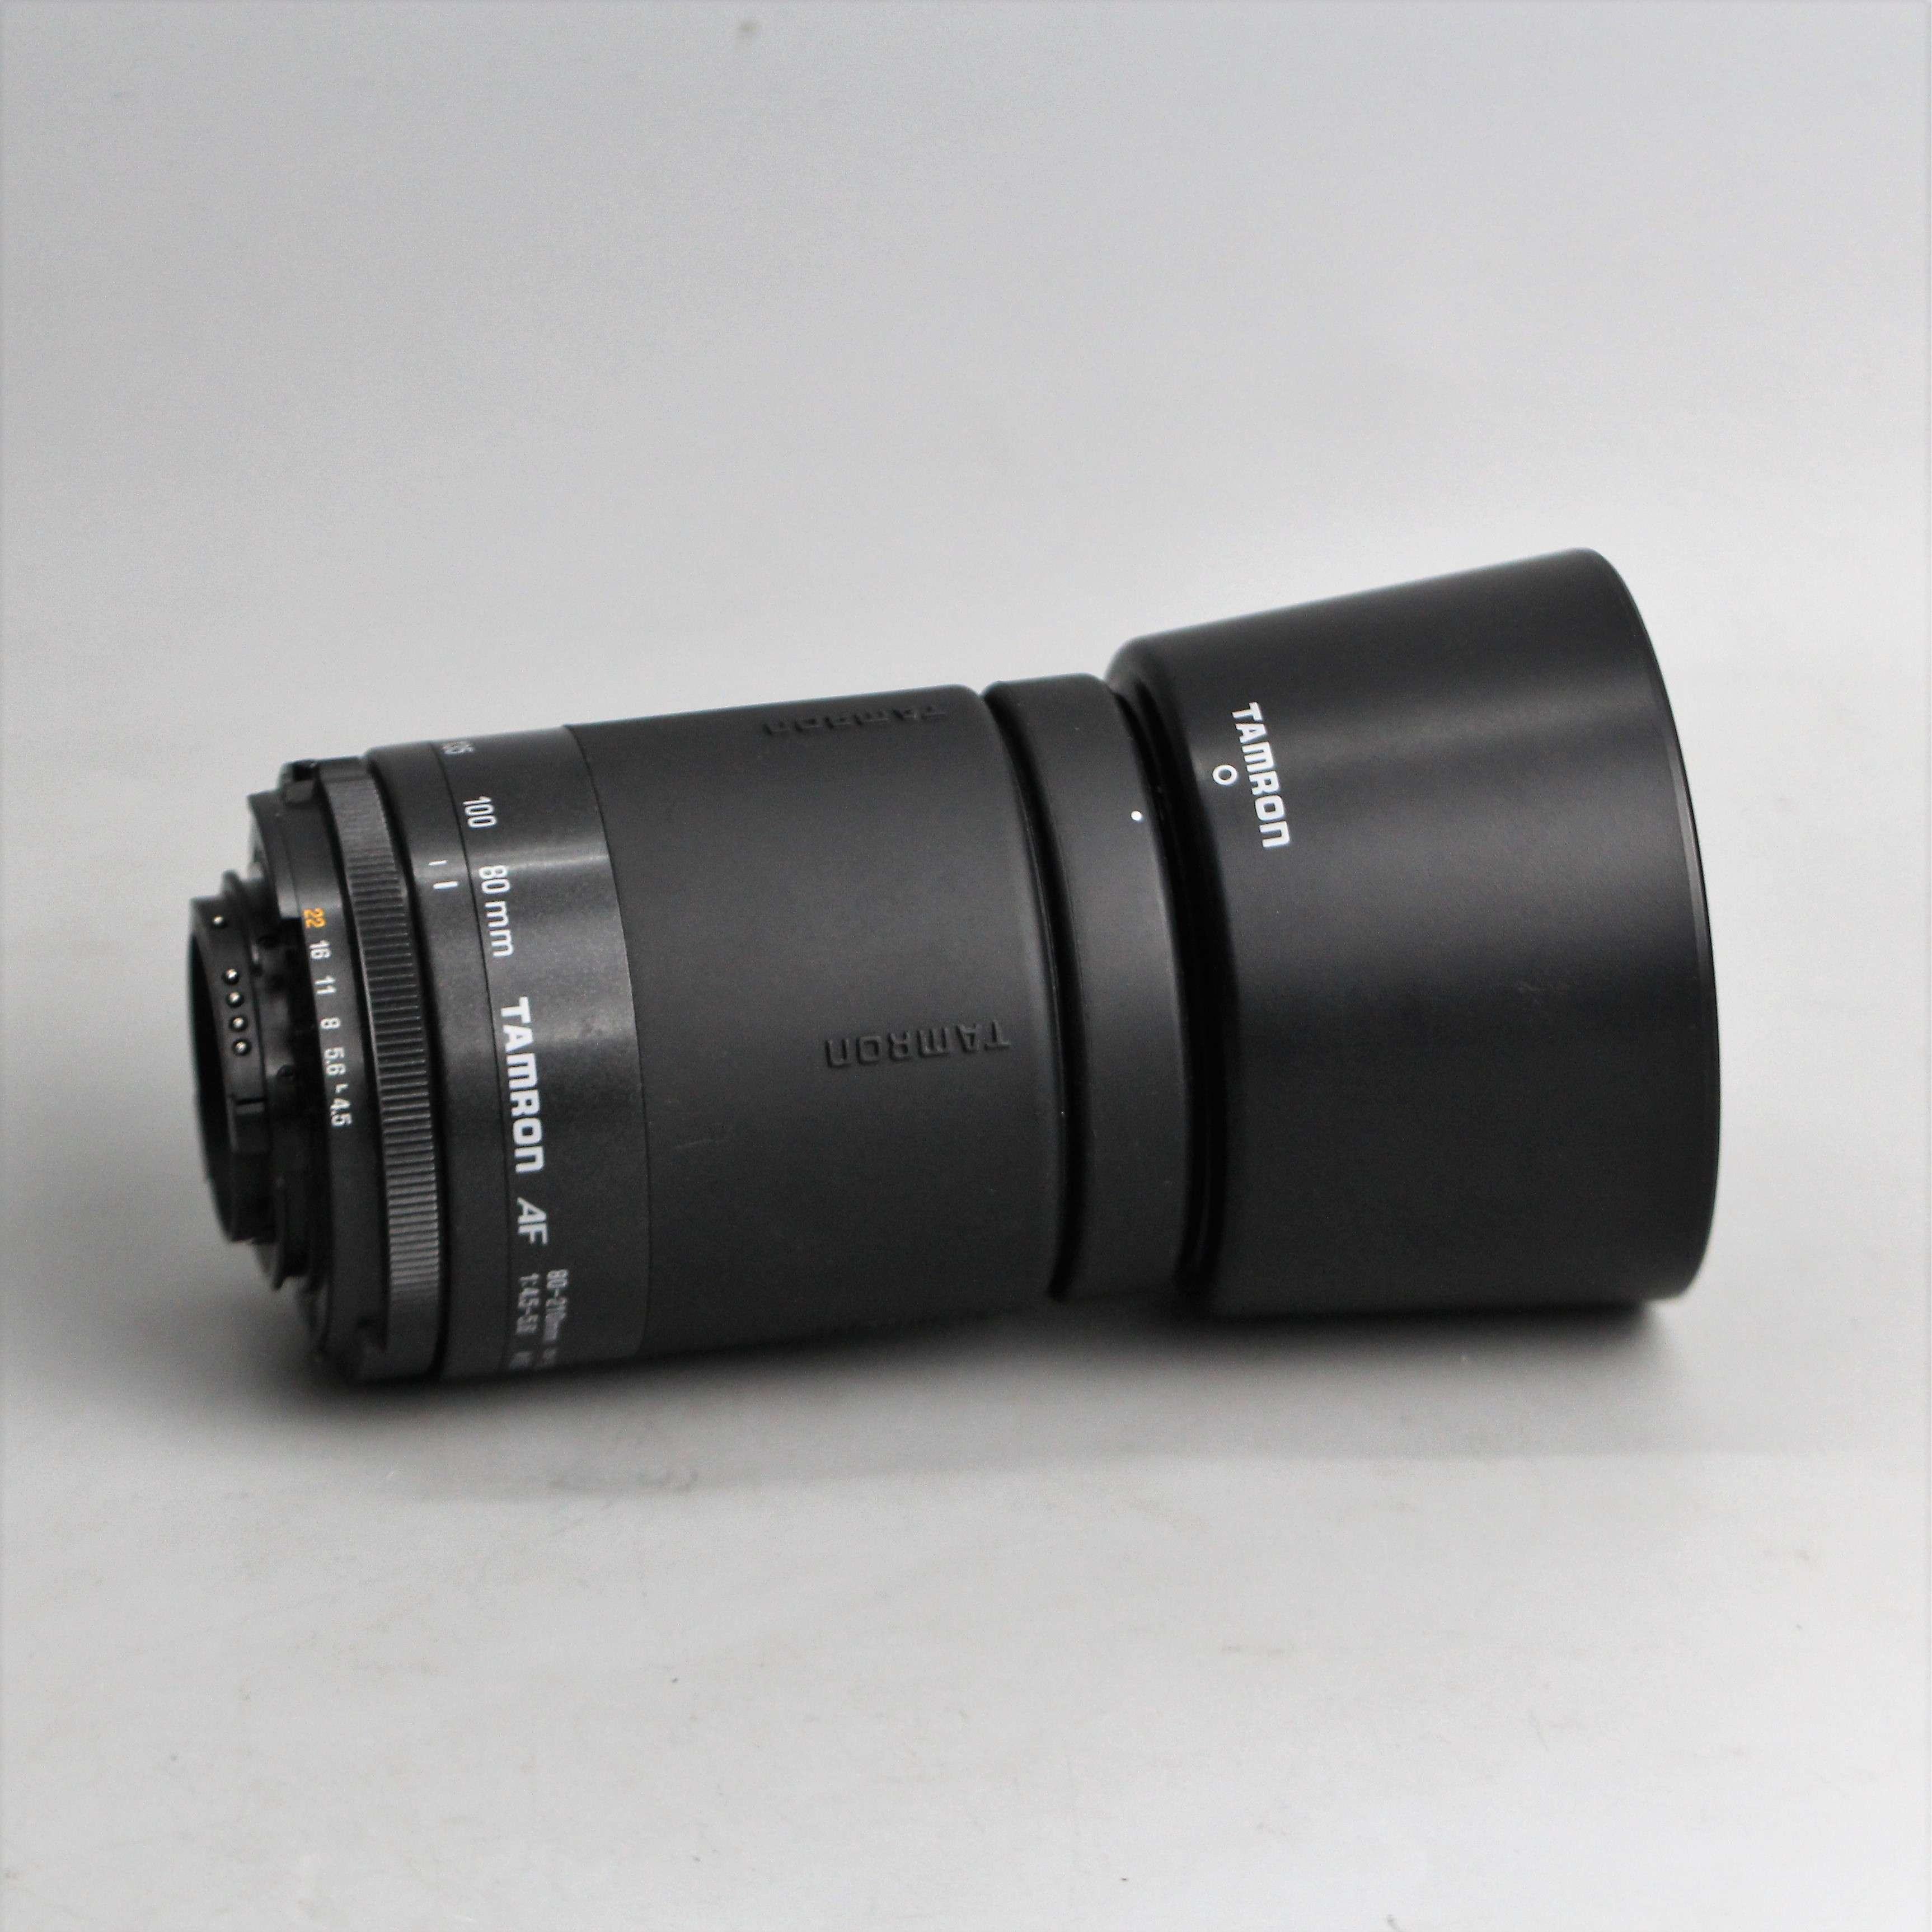 tamron-80-210mm-f4-5-5-6-af-nikon-80-210-4-5-5-6-10946